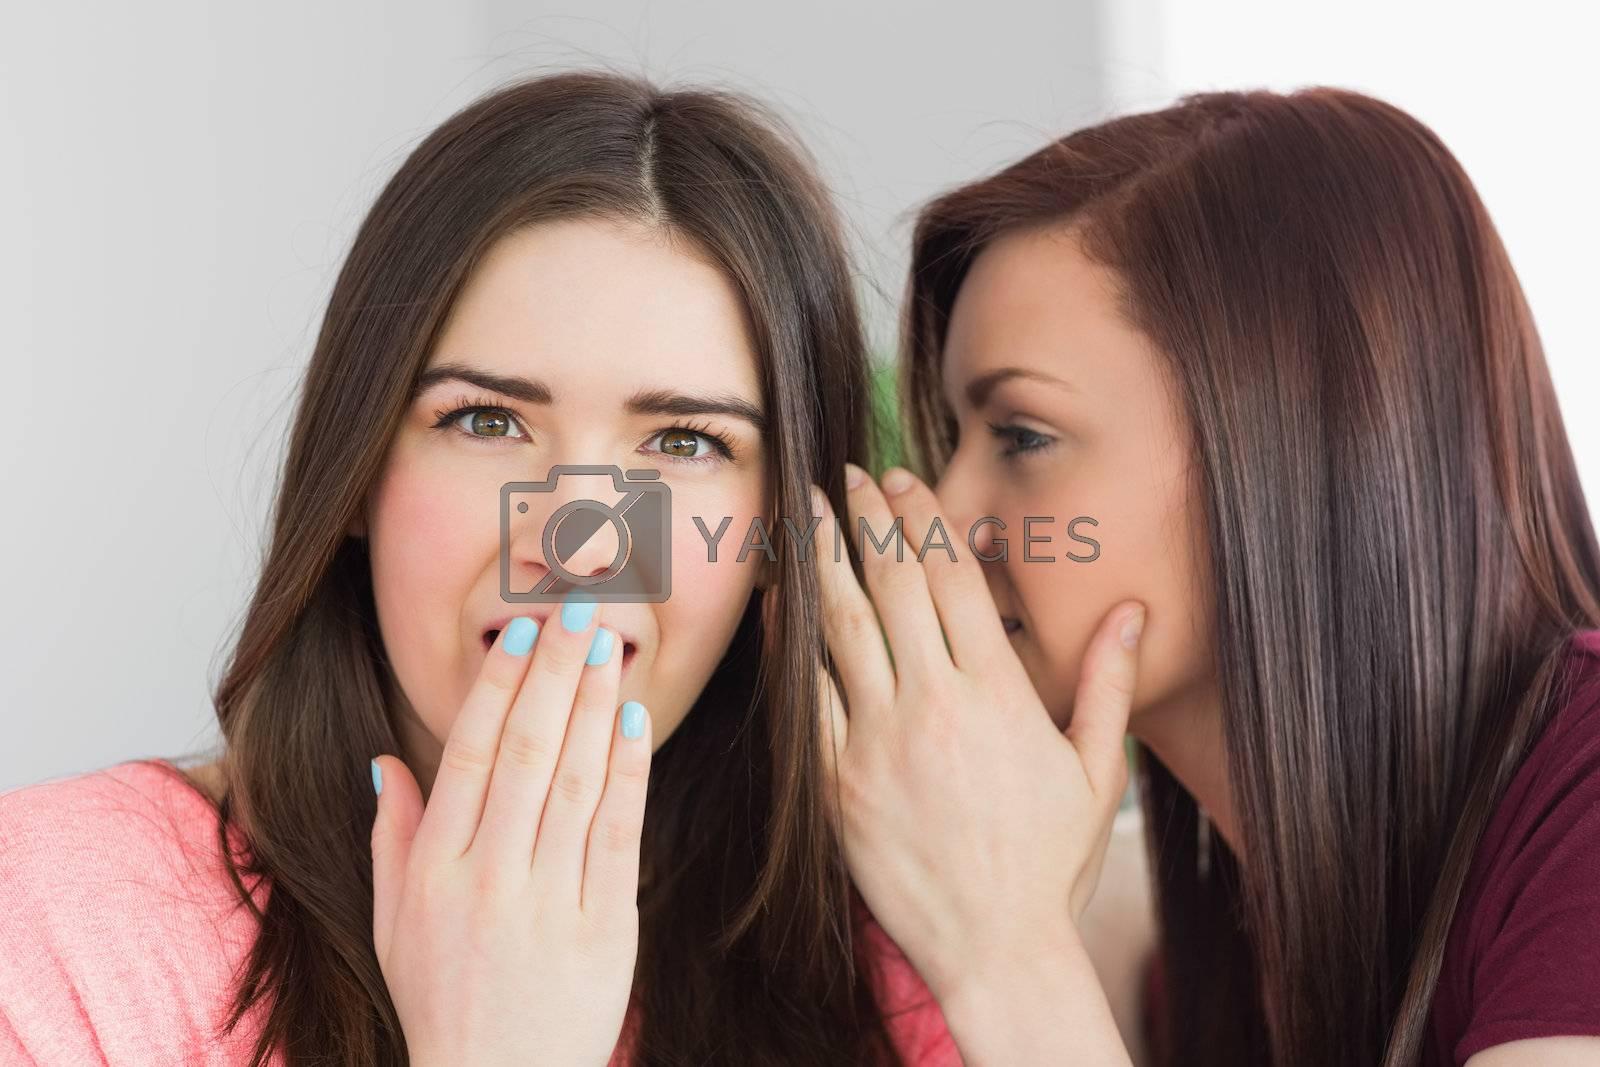 Two pretty girls sharing secrets by Wavebreakmedia